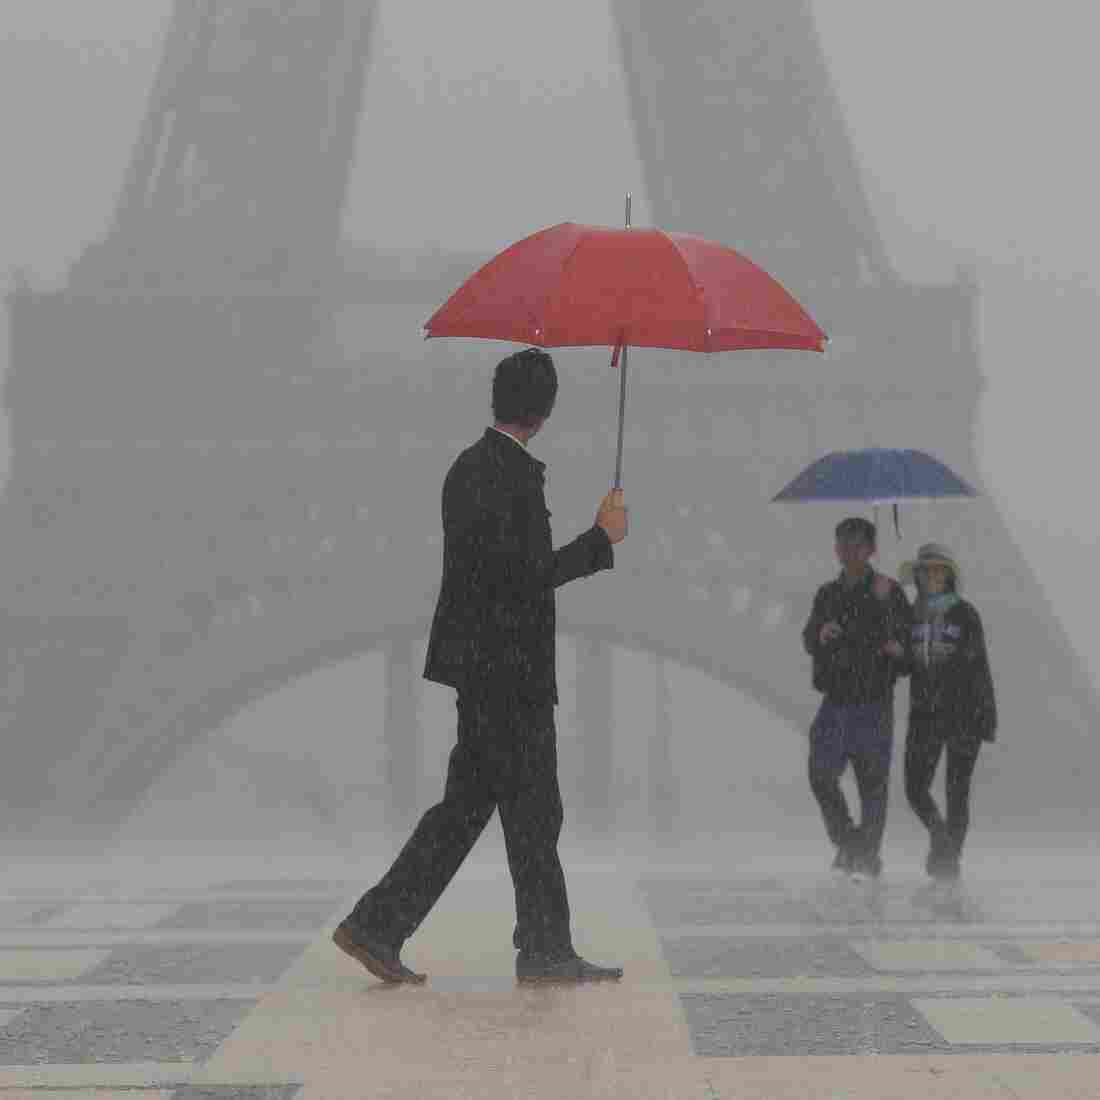 No Rain On His Parade: Parisian Preserves Art Of Umbrella Repair